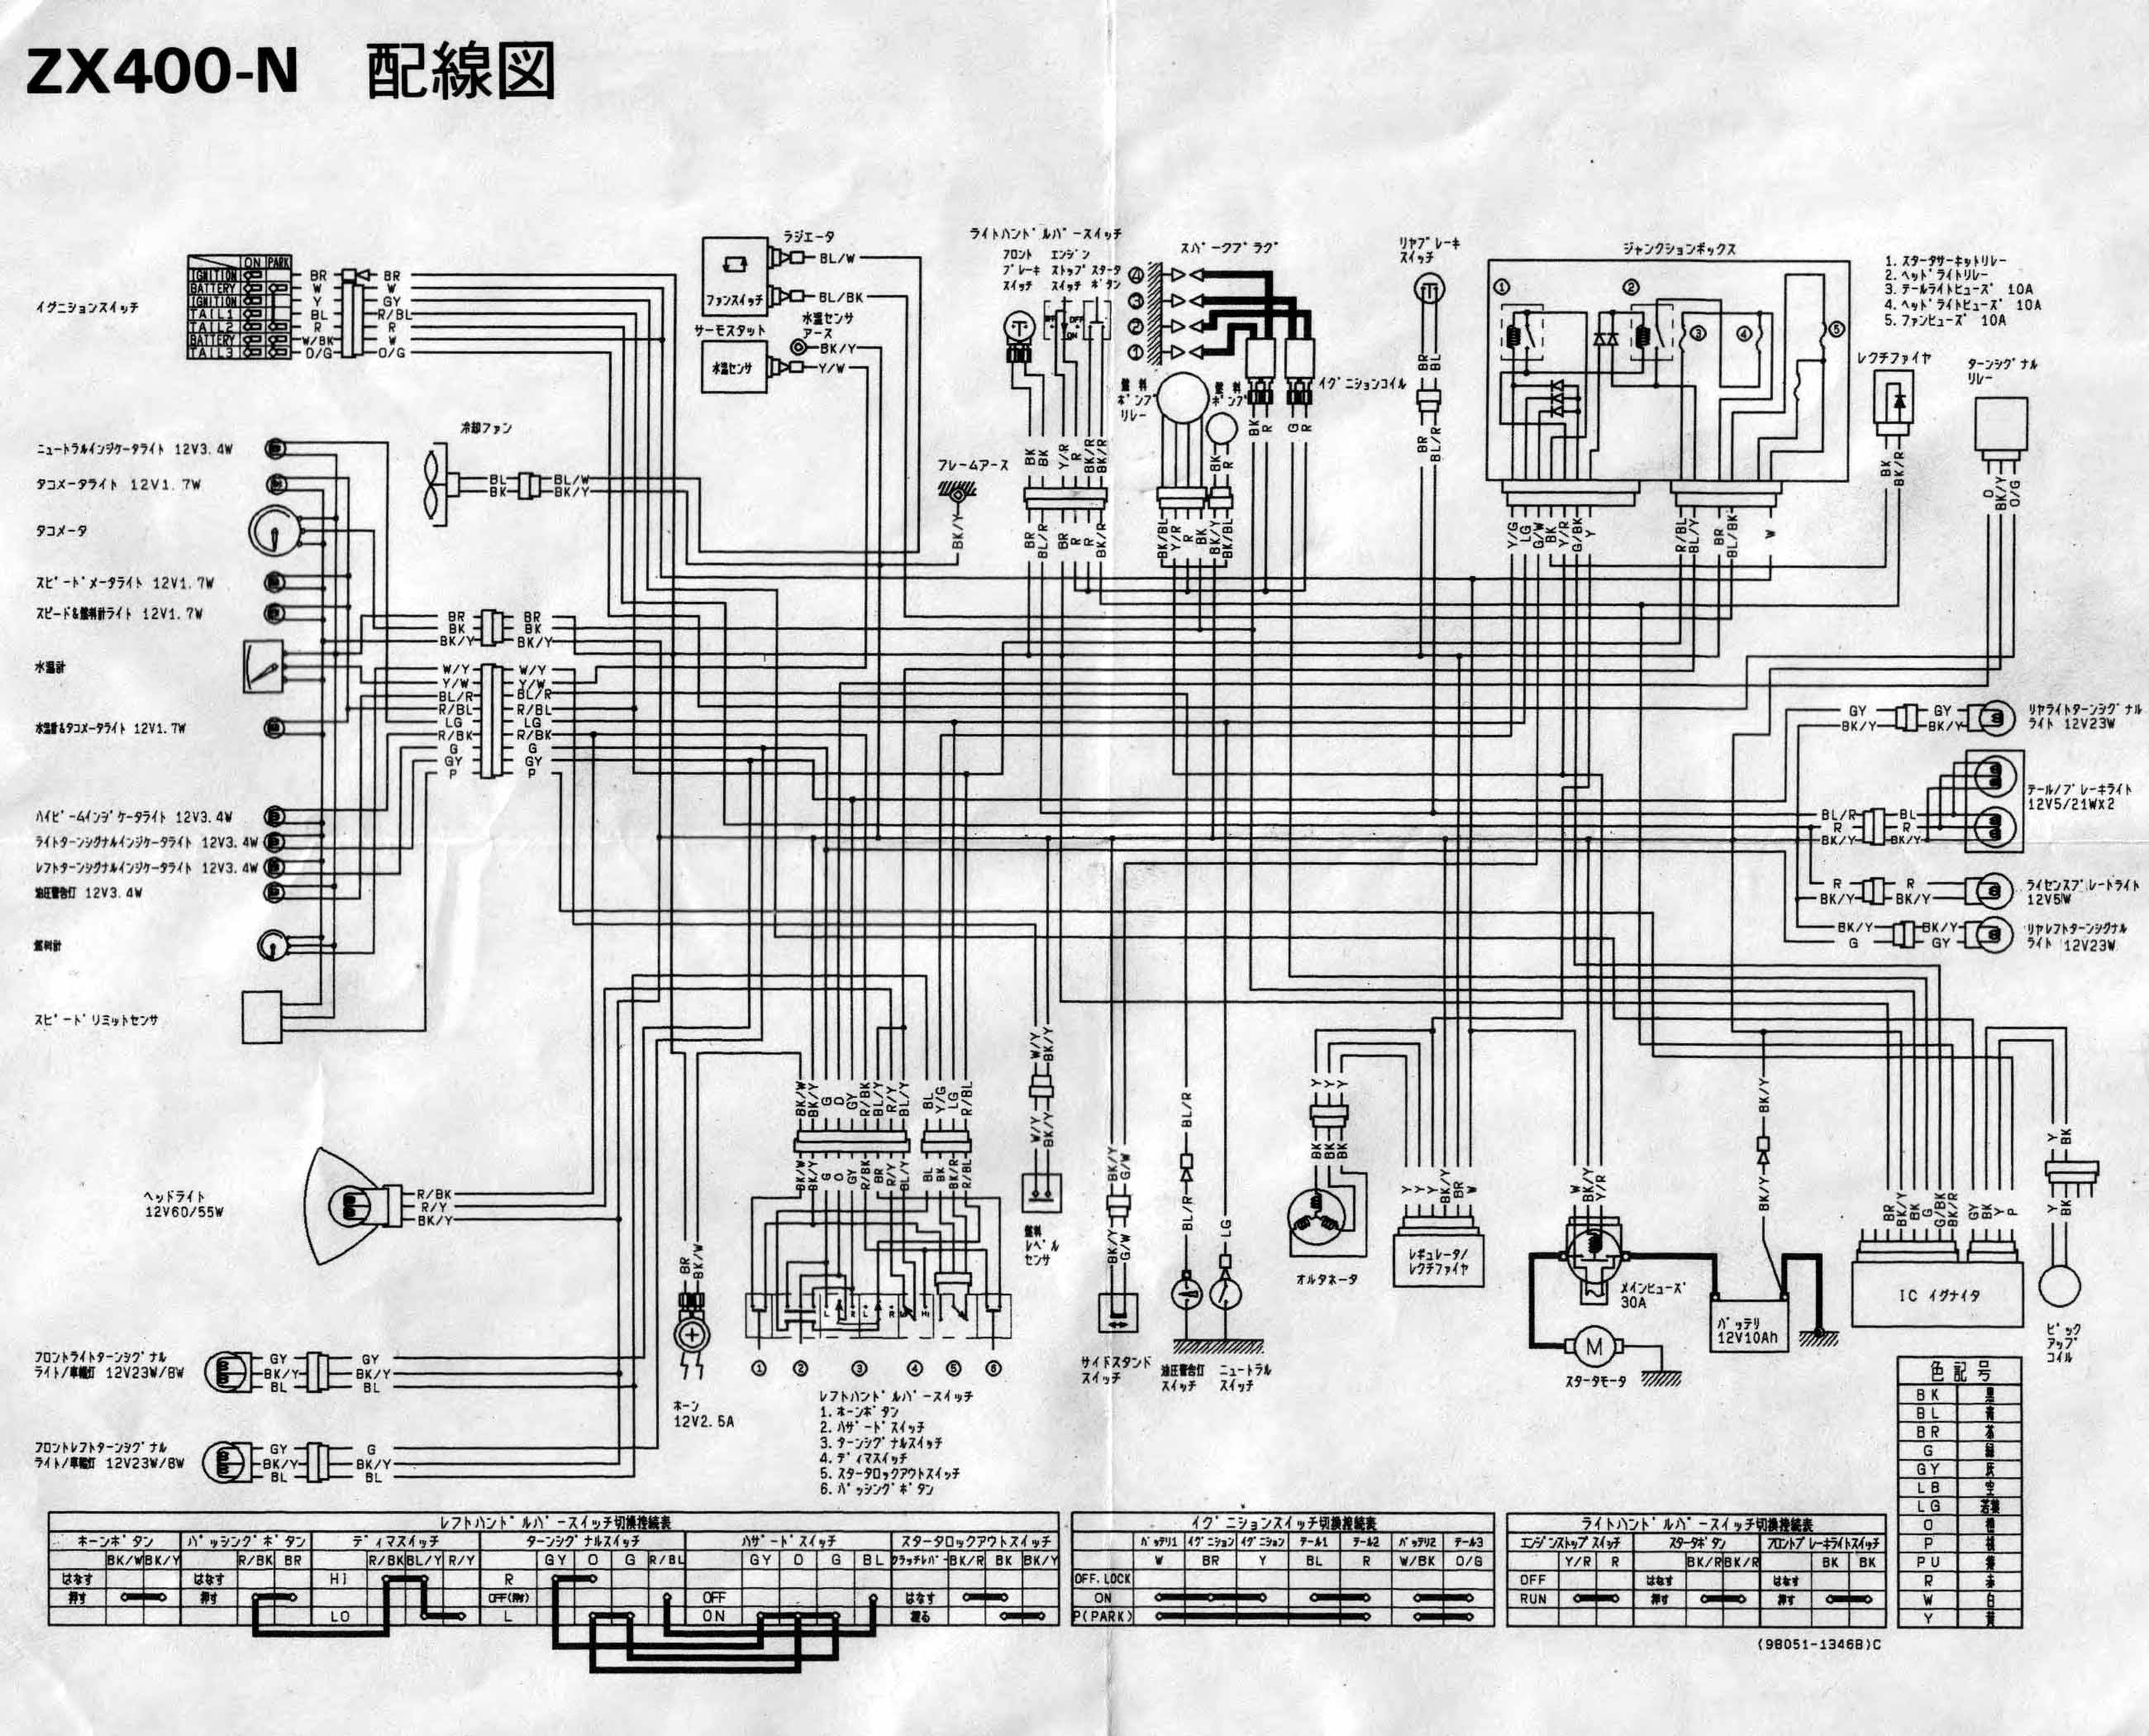 Wiring Diagram For A 2004 Kawasaki Kfx400 Qubee Quilts 650 Trusted Diagrams